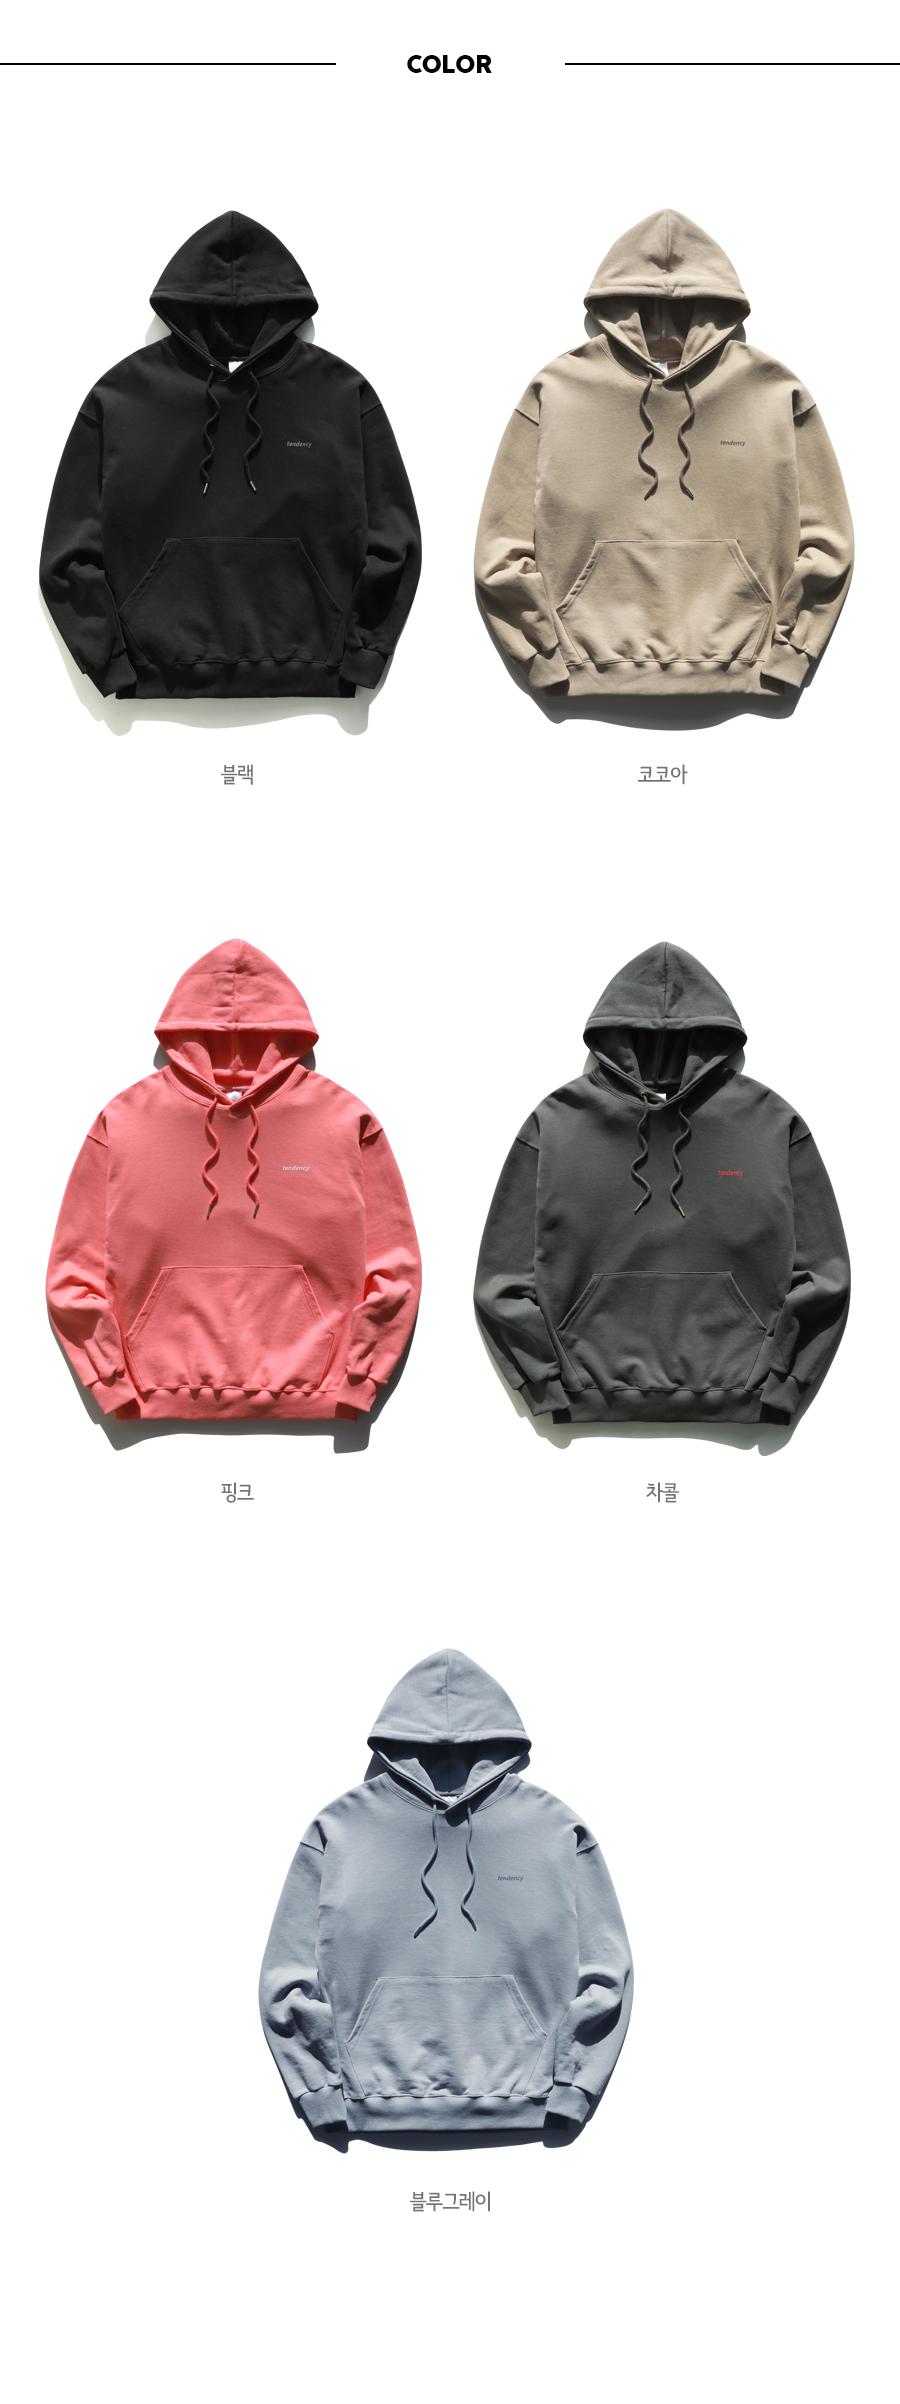 20190114_pigment_washing_hood_color_yh.jpg